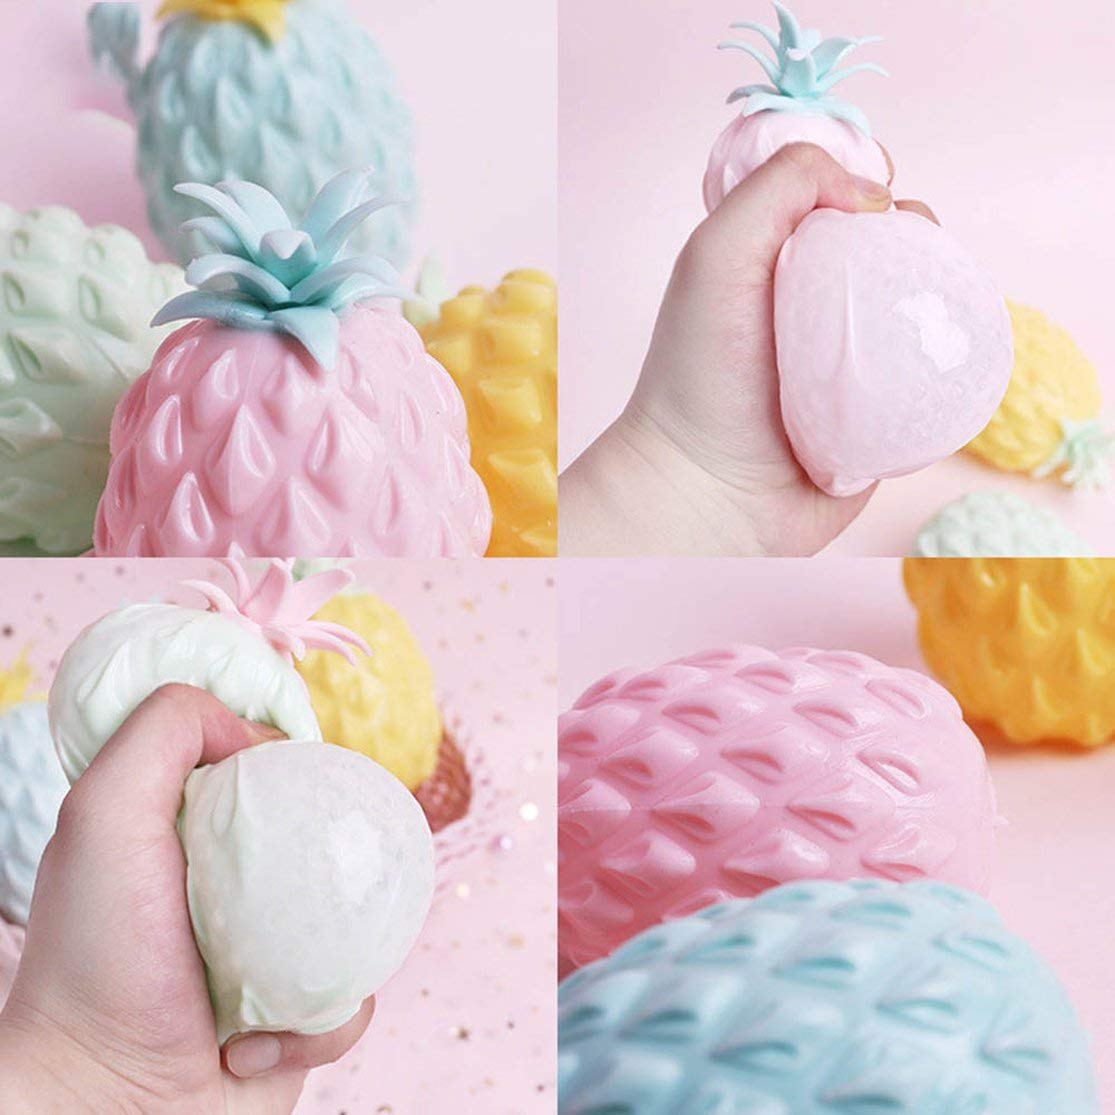 LouiseEvel215 Mochi Squishies Stress Relief Toys Pi/ña Squichies Toys Dise/ño Lindo Soft Squishies Fruit Stress Juguetes de descompresi/ón